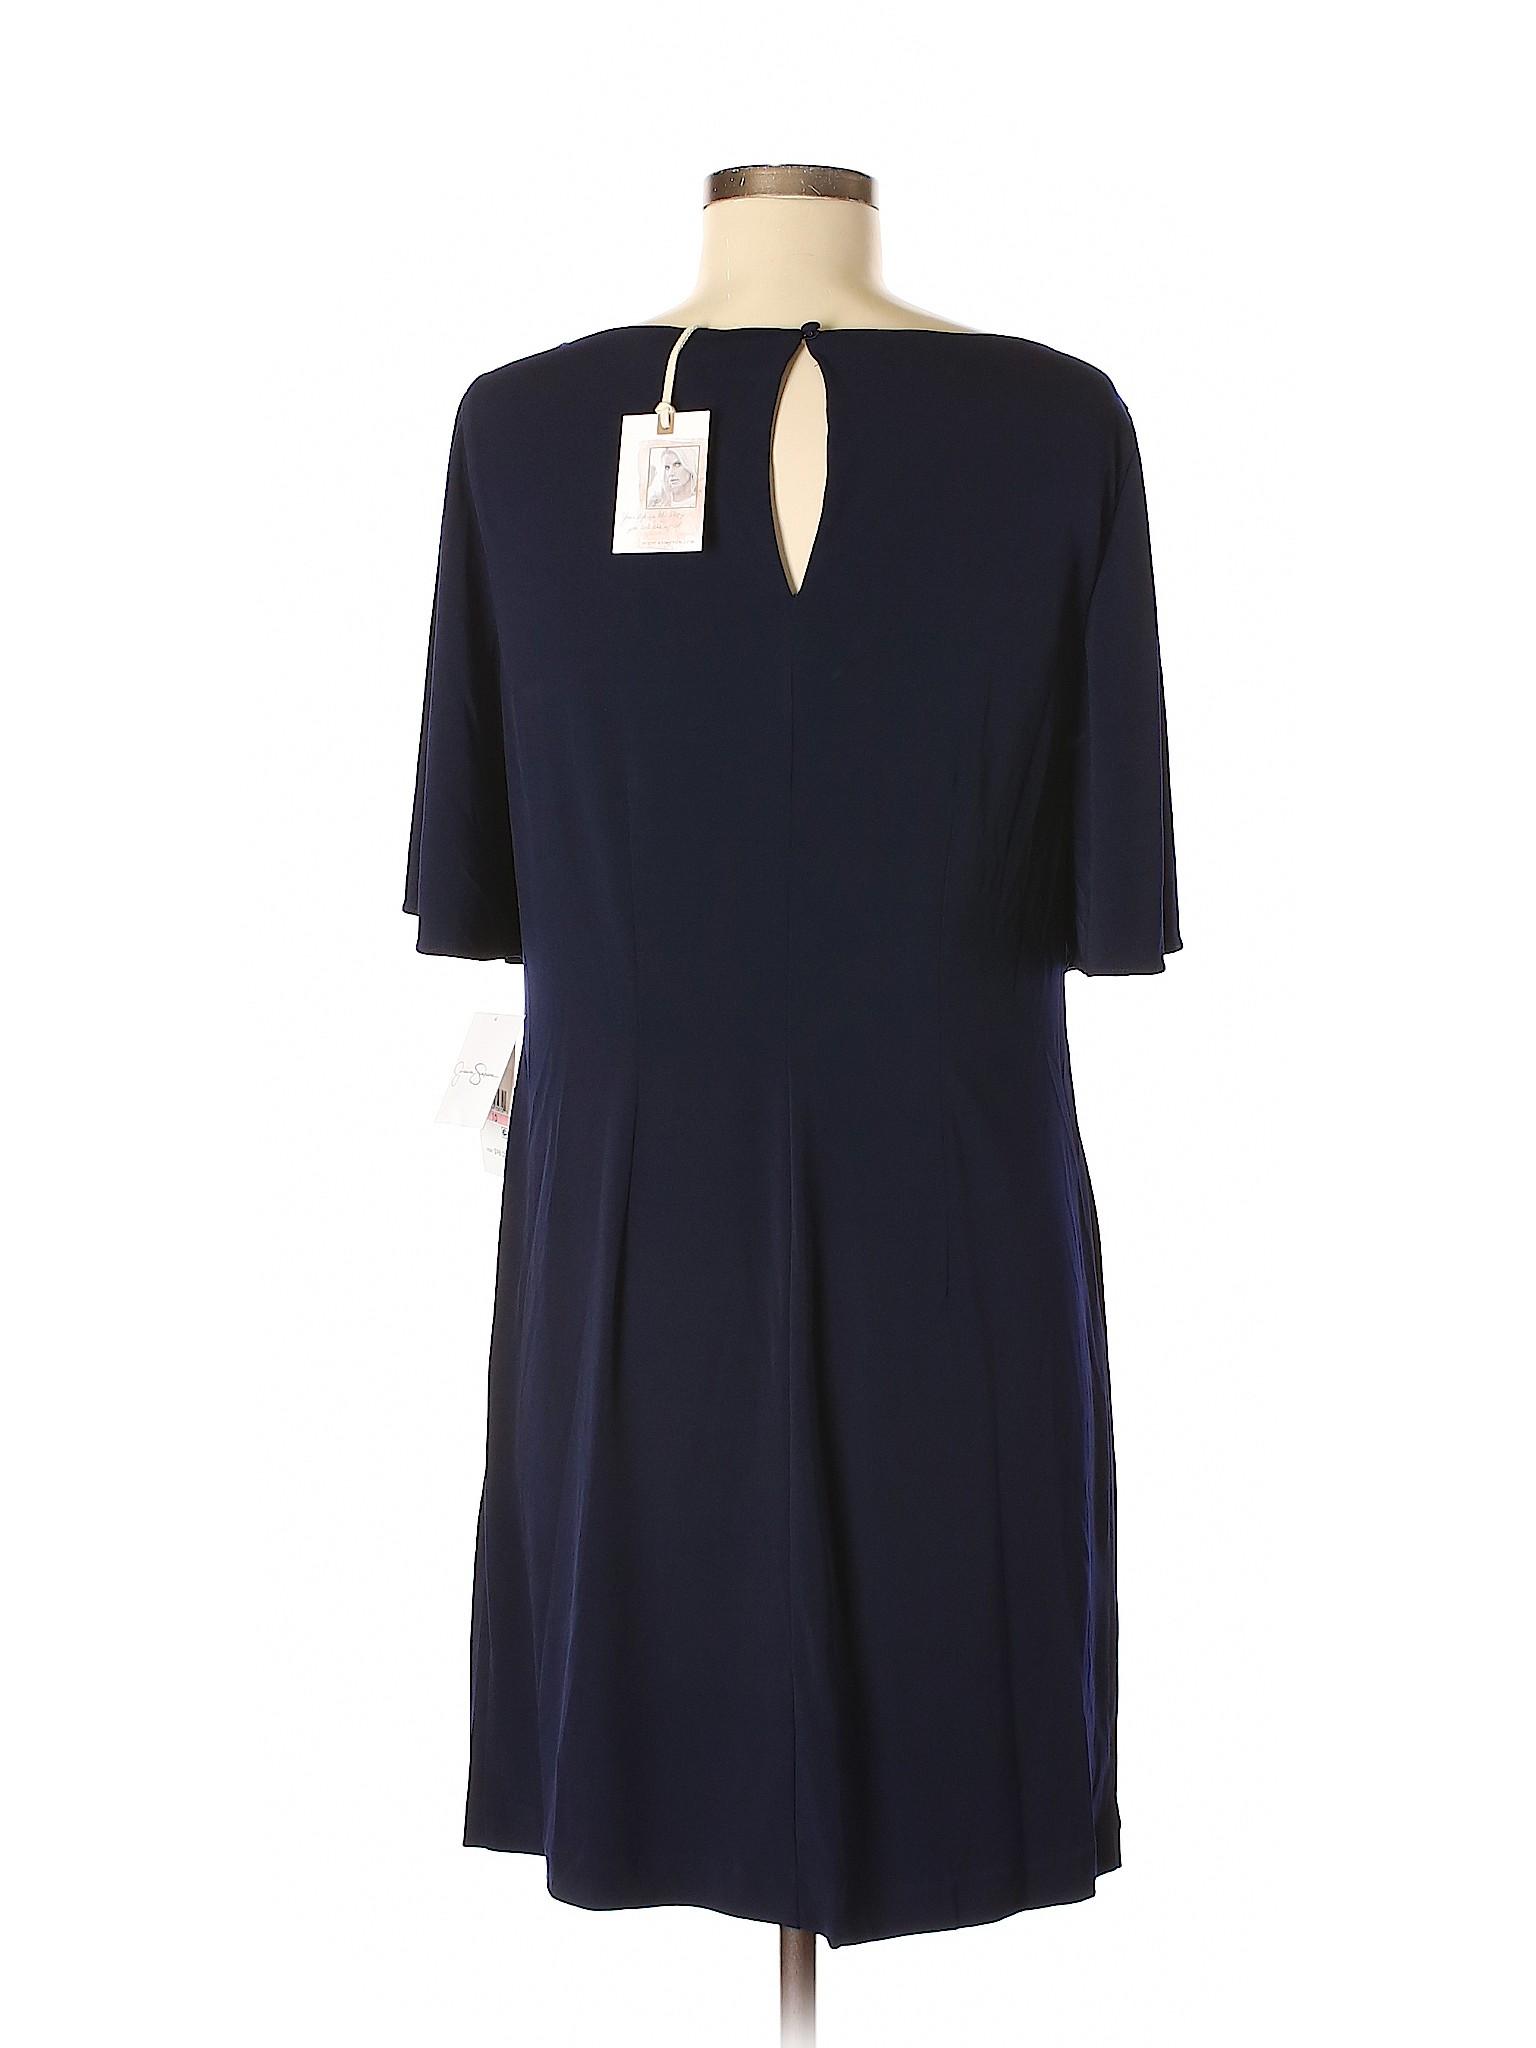 Boutique Simpson Casual winter Dress Jessica PrwqAzPx